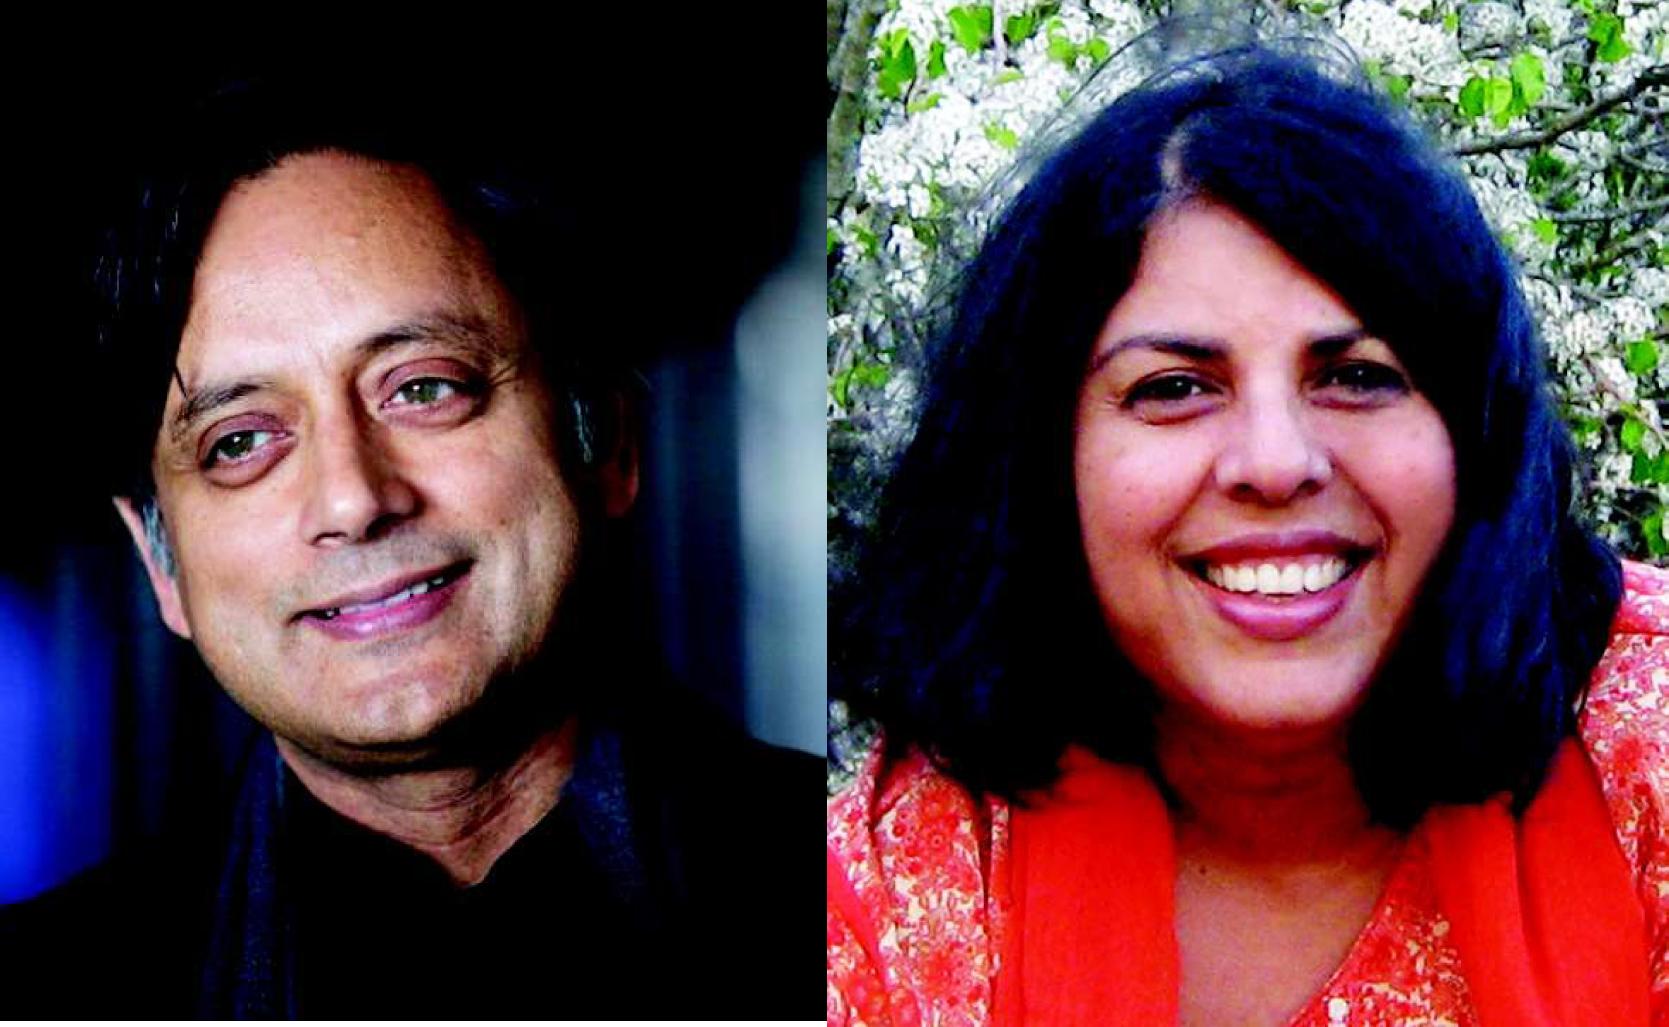 Shashi Tharoor and author Chitra Banerjee Divakaruni will be at JLF Toronto 2019 this month.